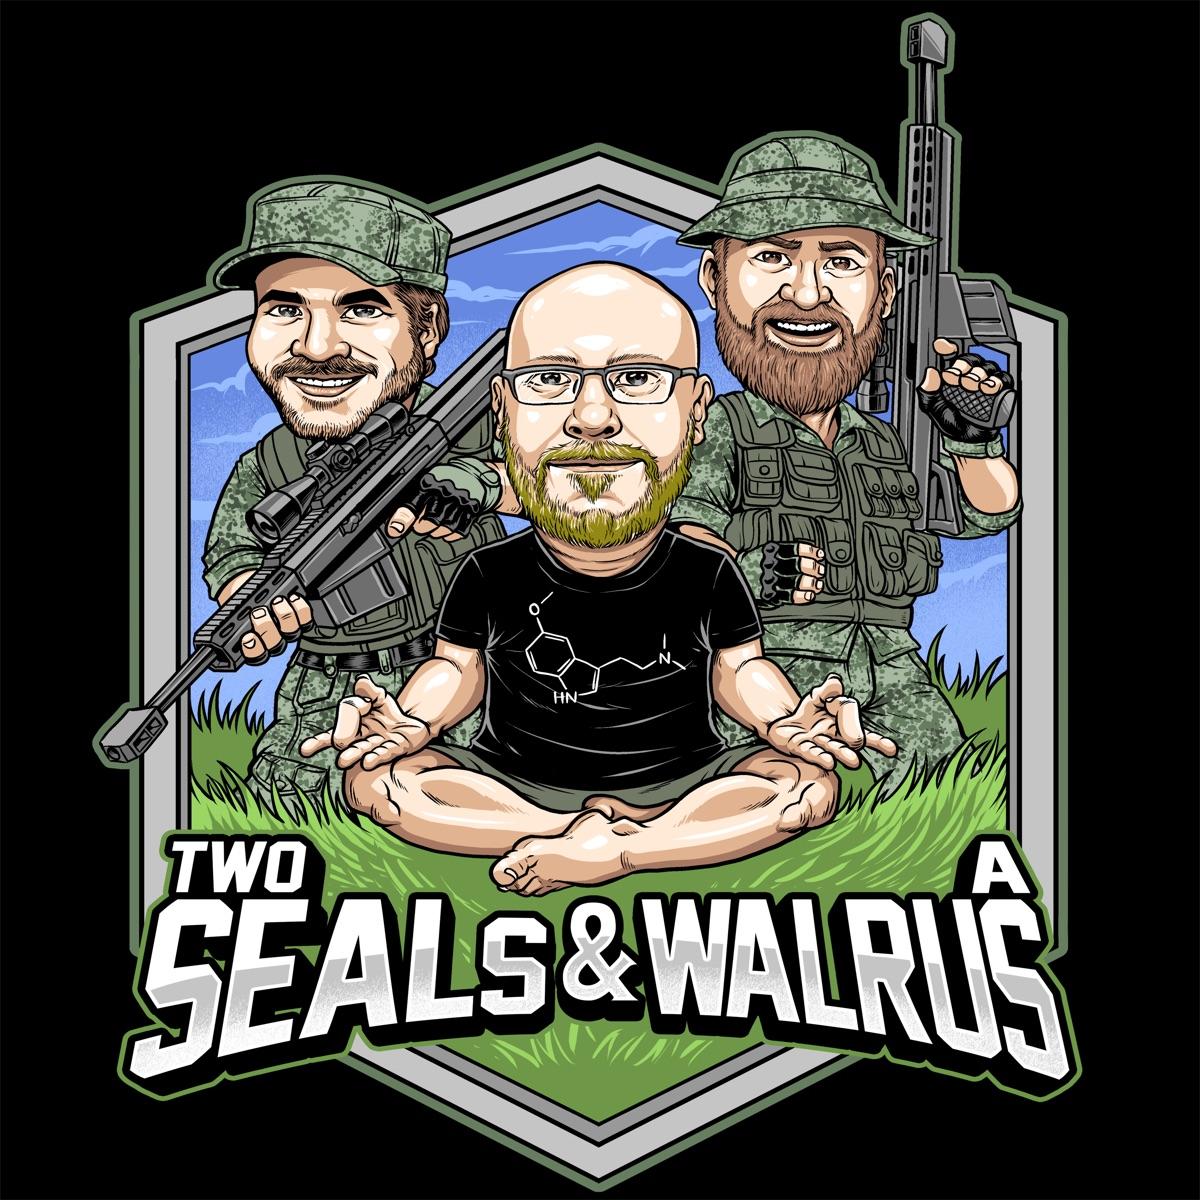 TwoSEALsandaWalrus's podcast